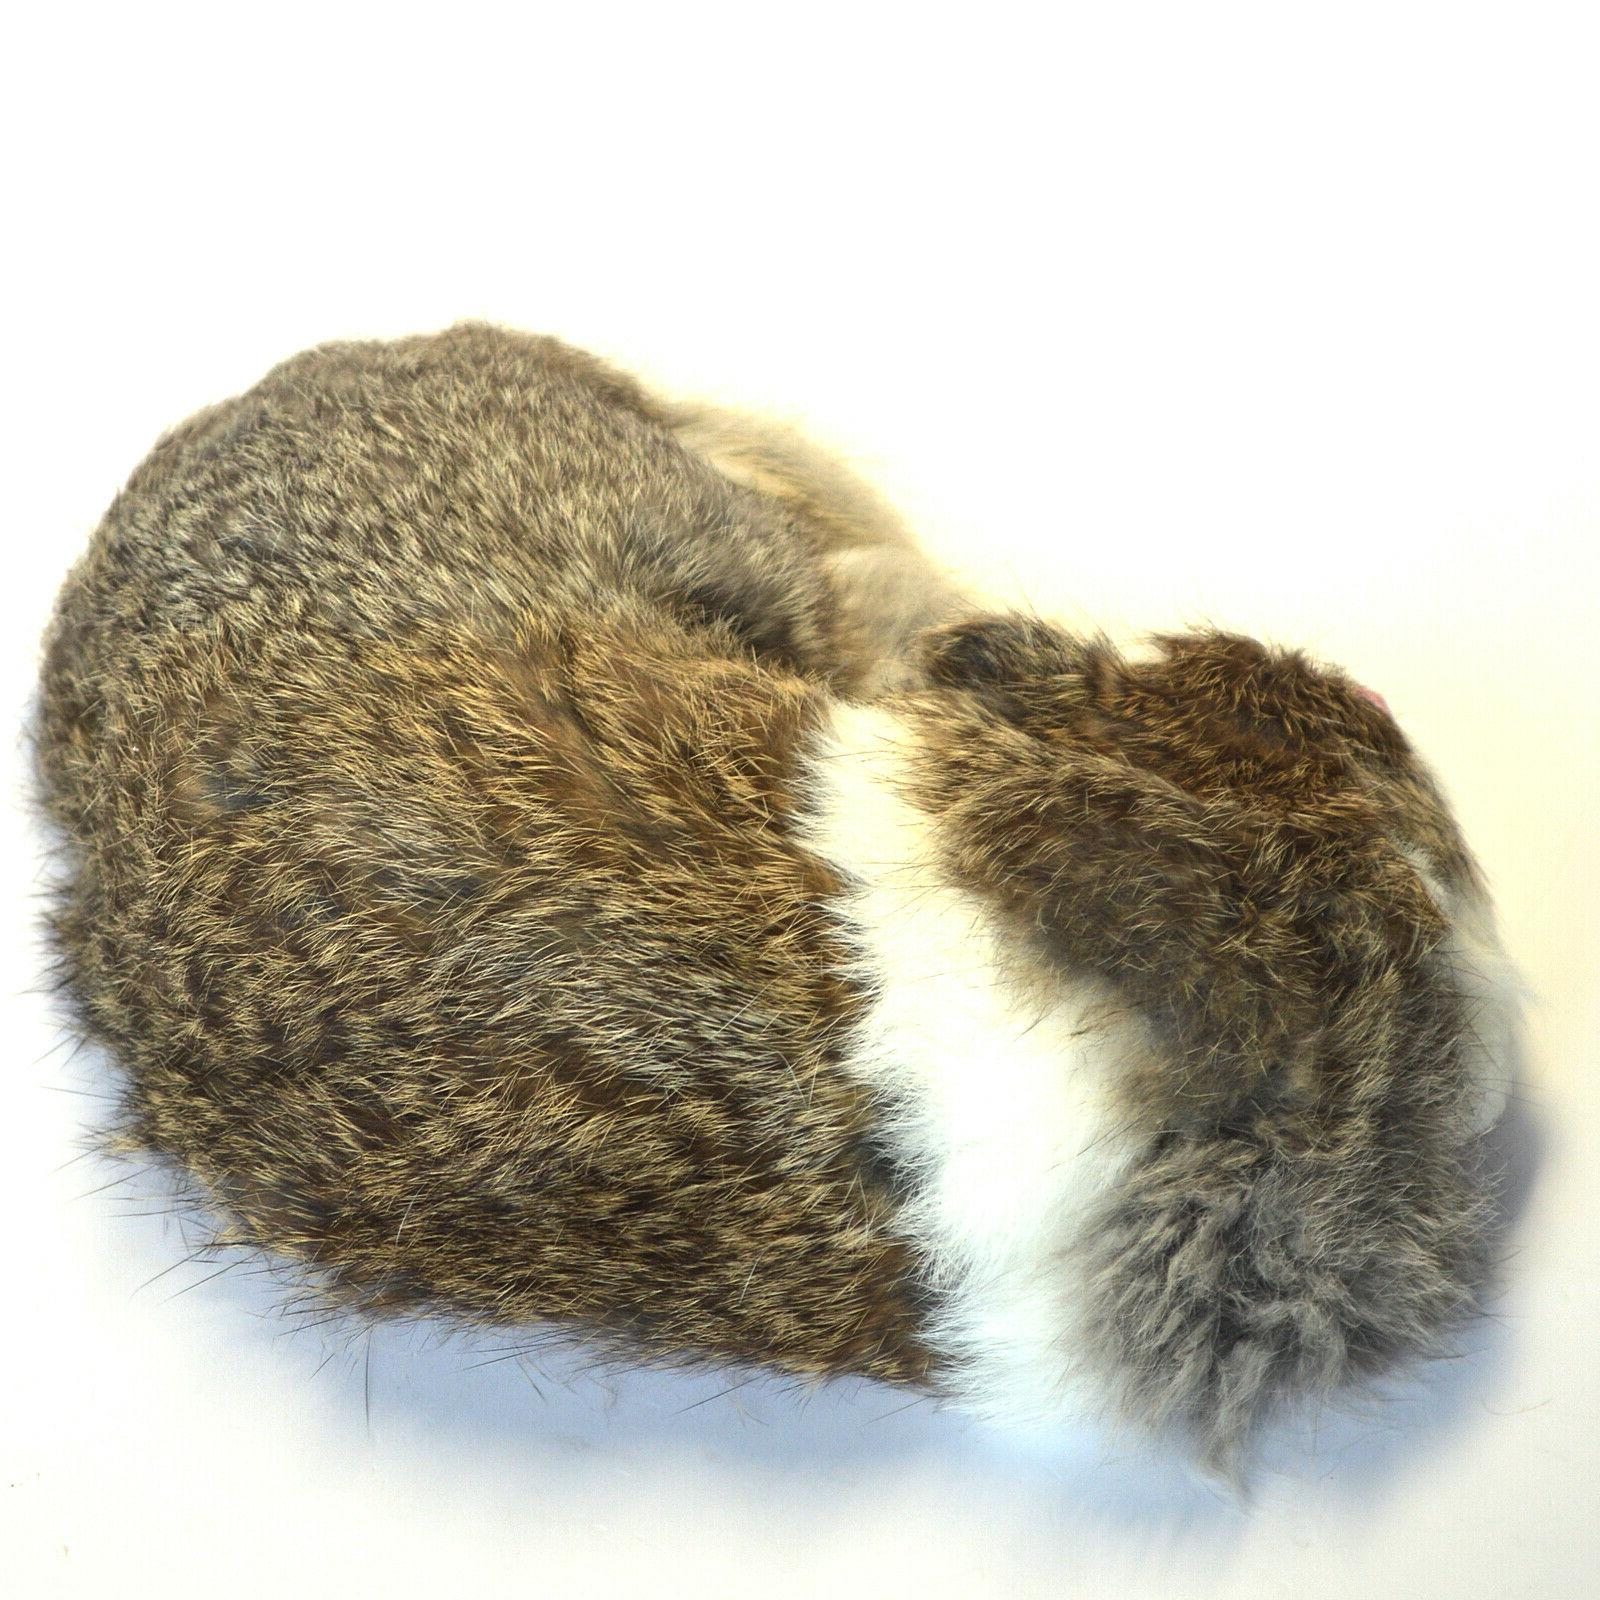 Realistic Lifelike Kitten Plush Soft Furry